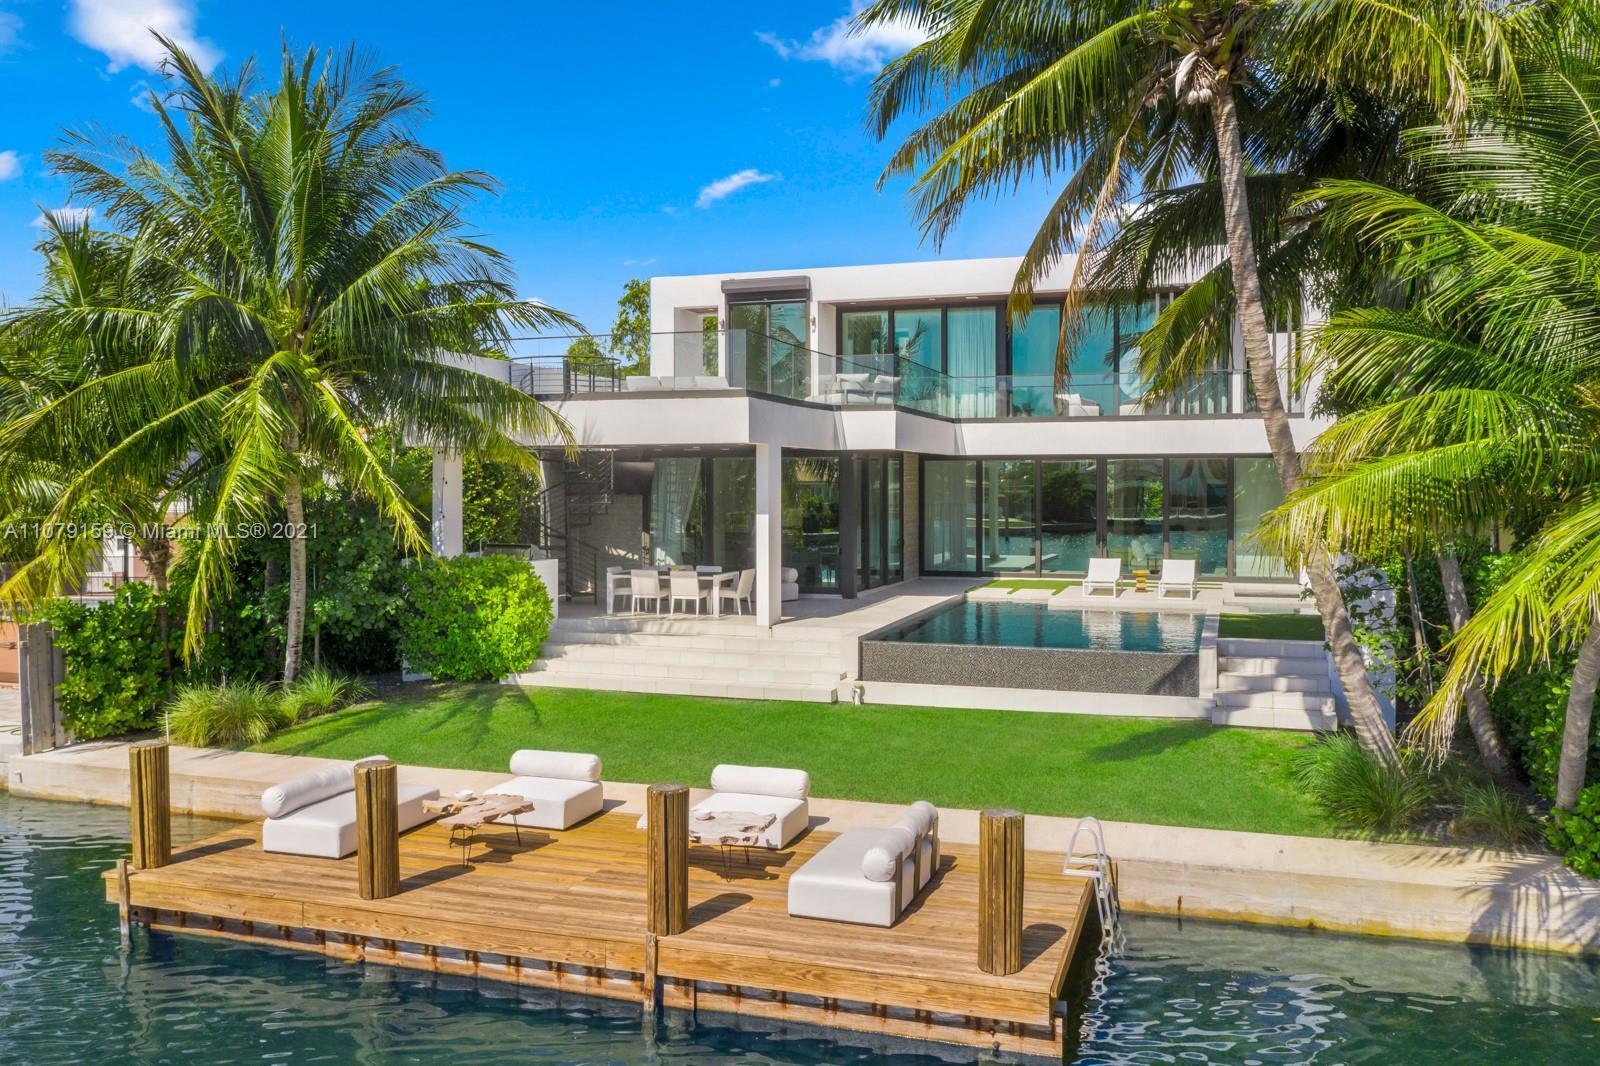 Stunning Contemporary Waterfront Architecture by Choeff Levy Fischman in Surfside's Biscaya Island!